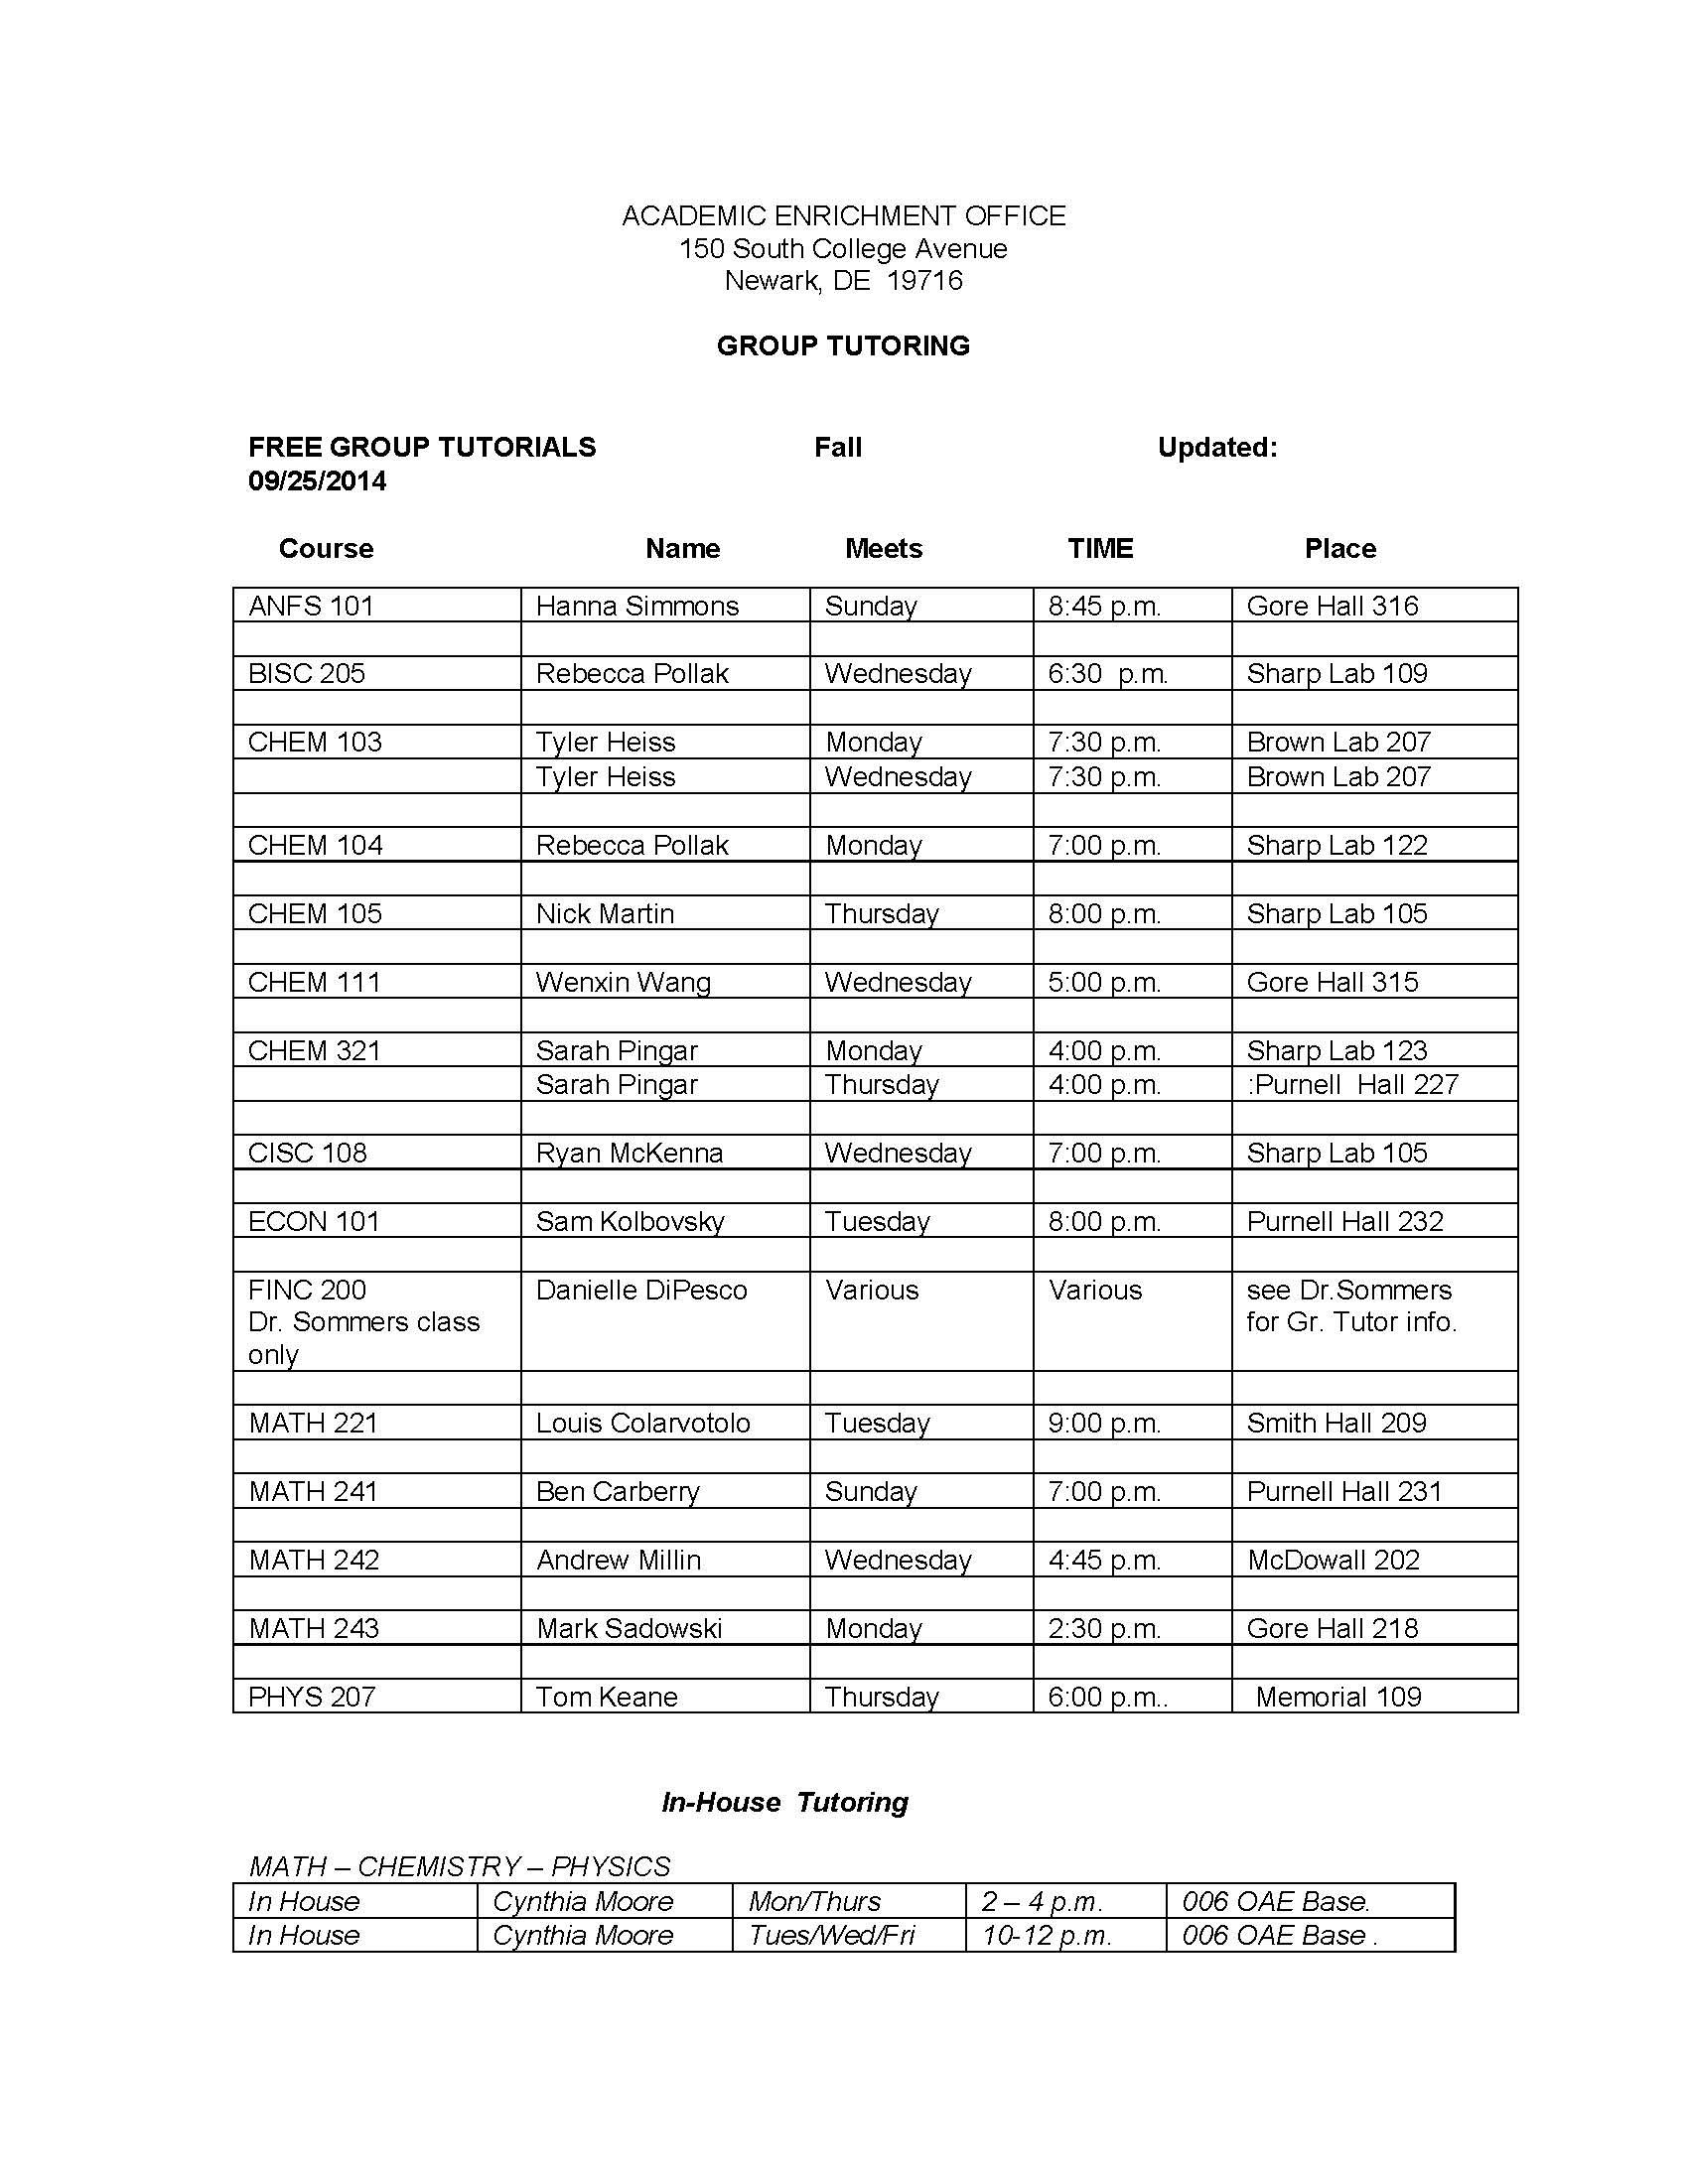 Group Tutoring-AEC - 2014 Fall